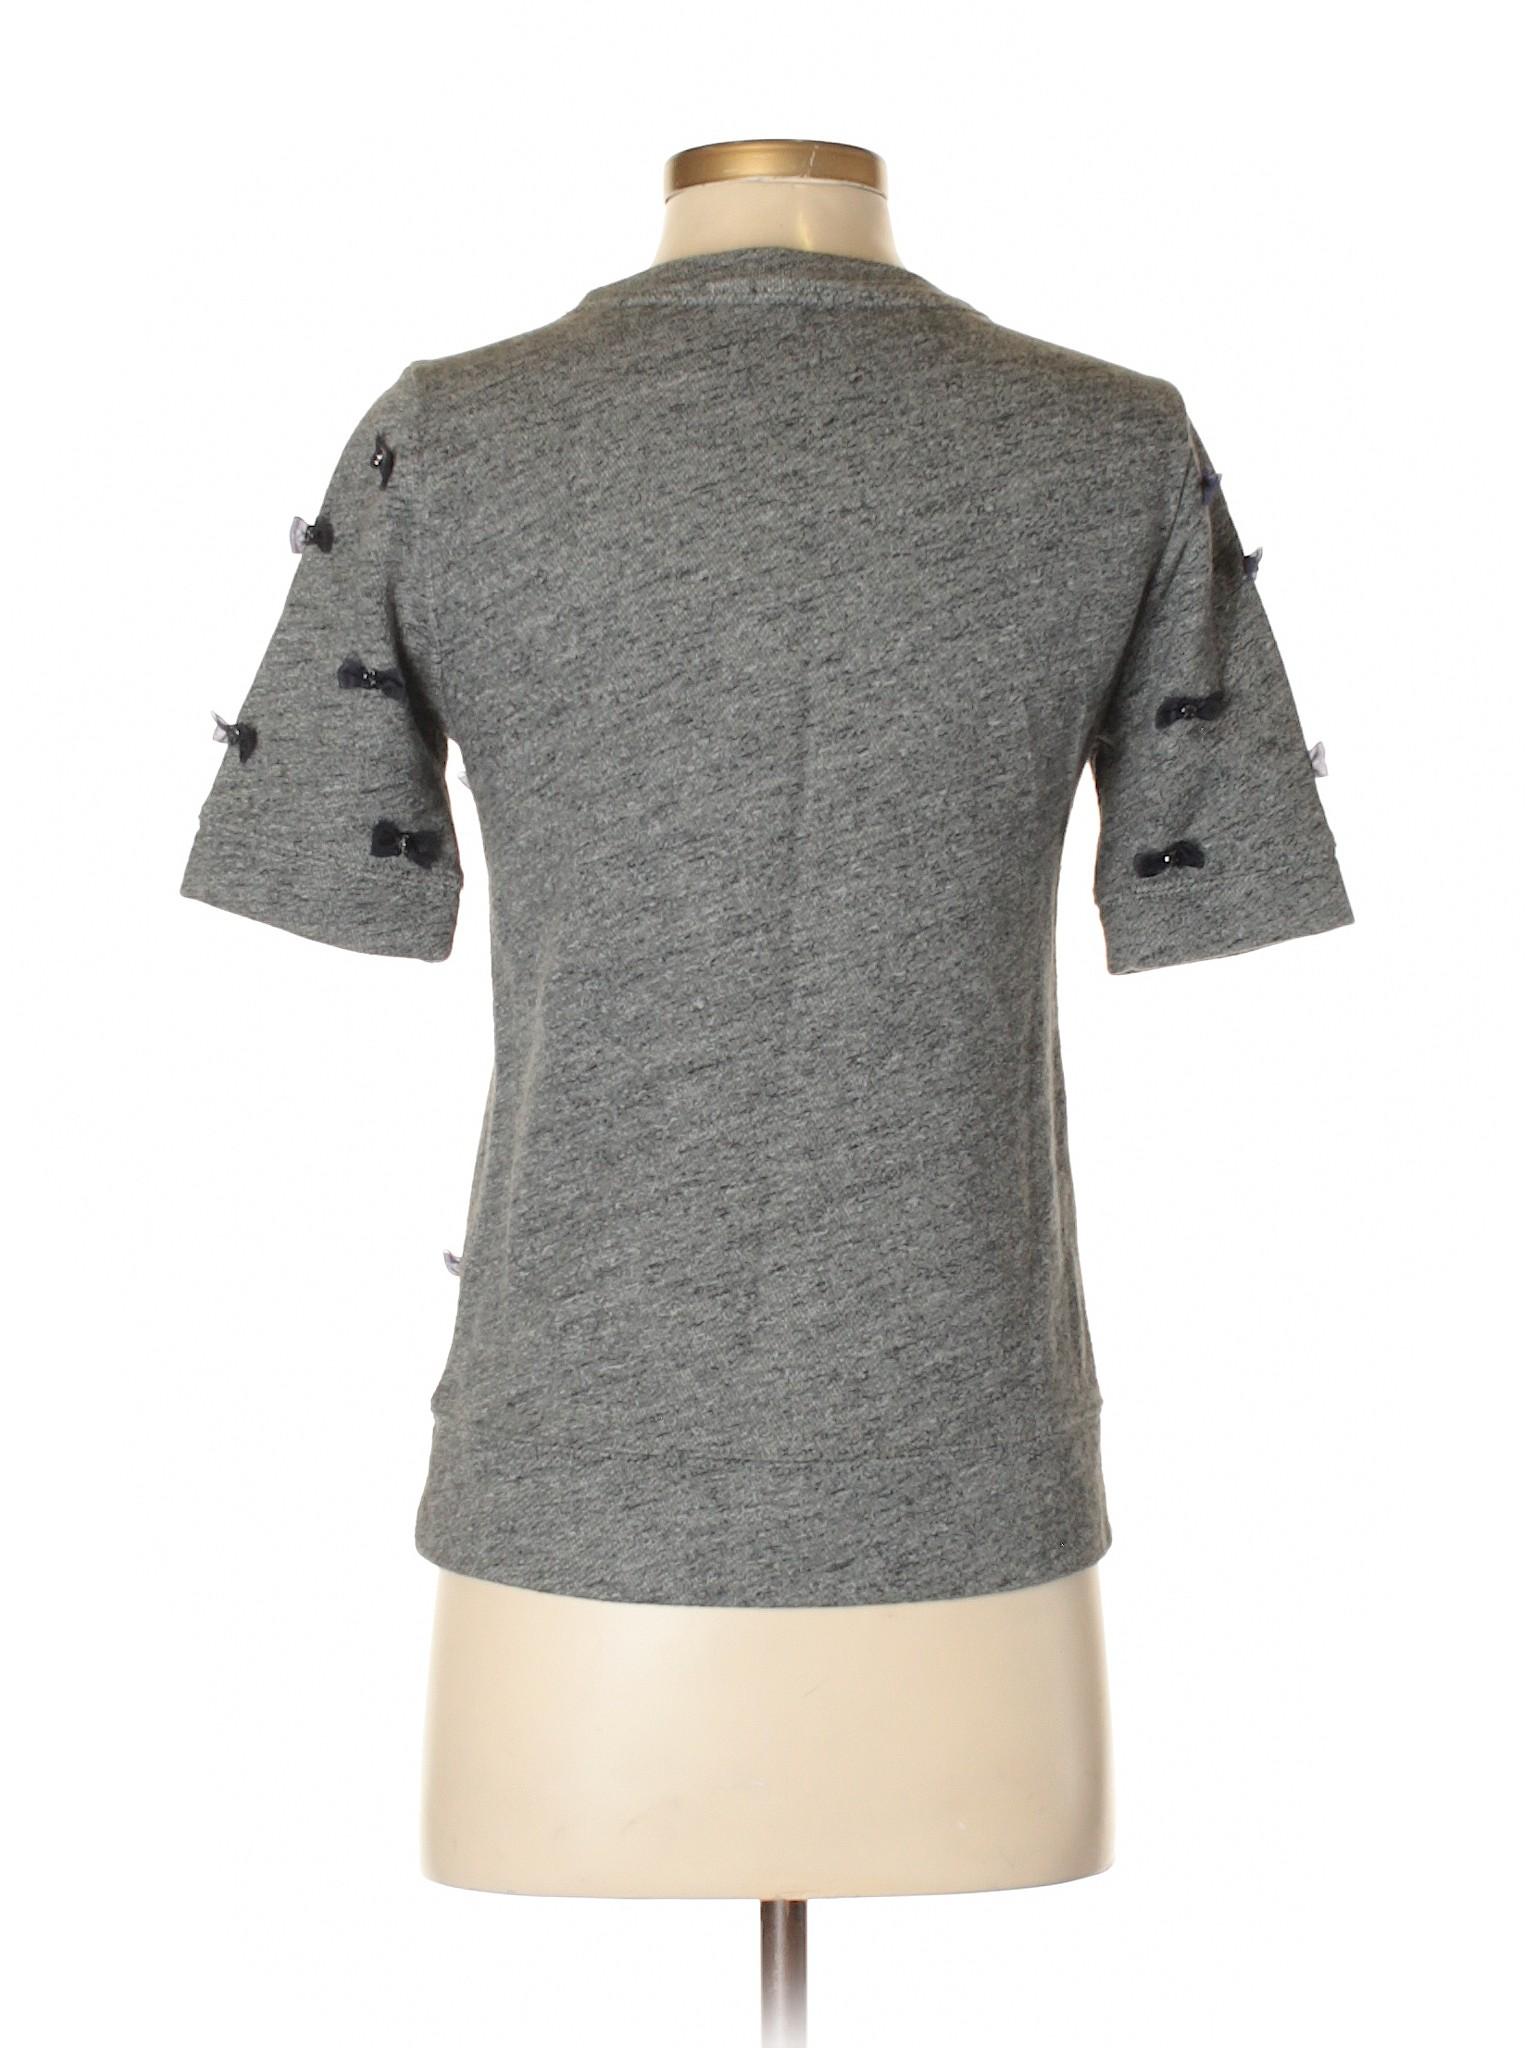 Sweater Pullover Crew Boutique Boutique J J nqxwXYF7B